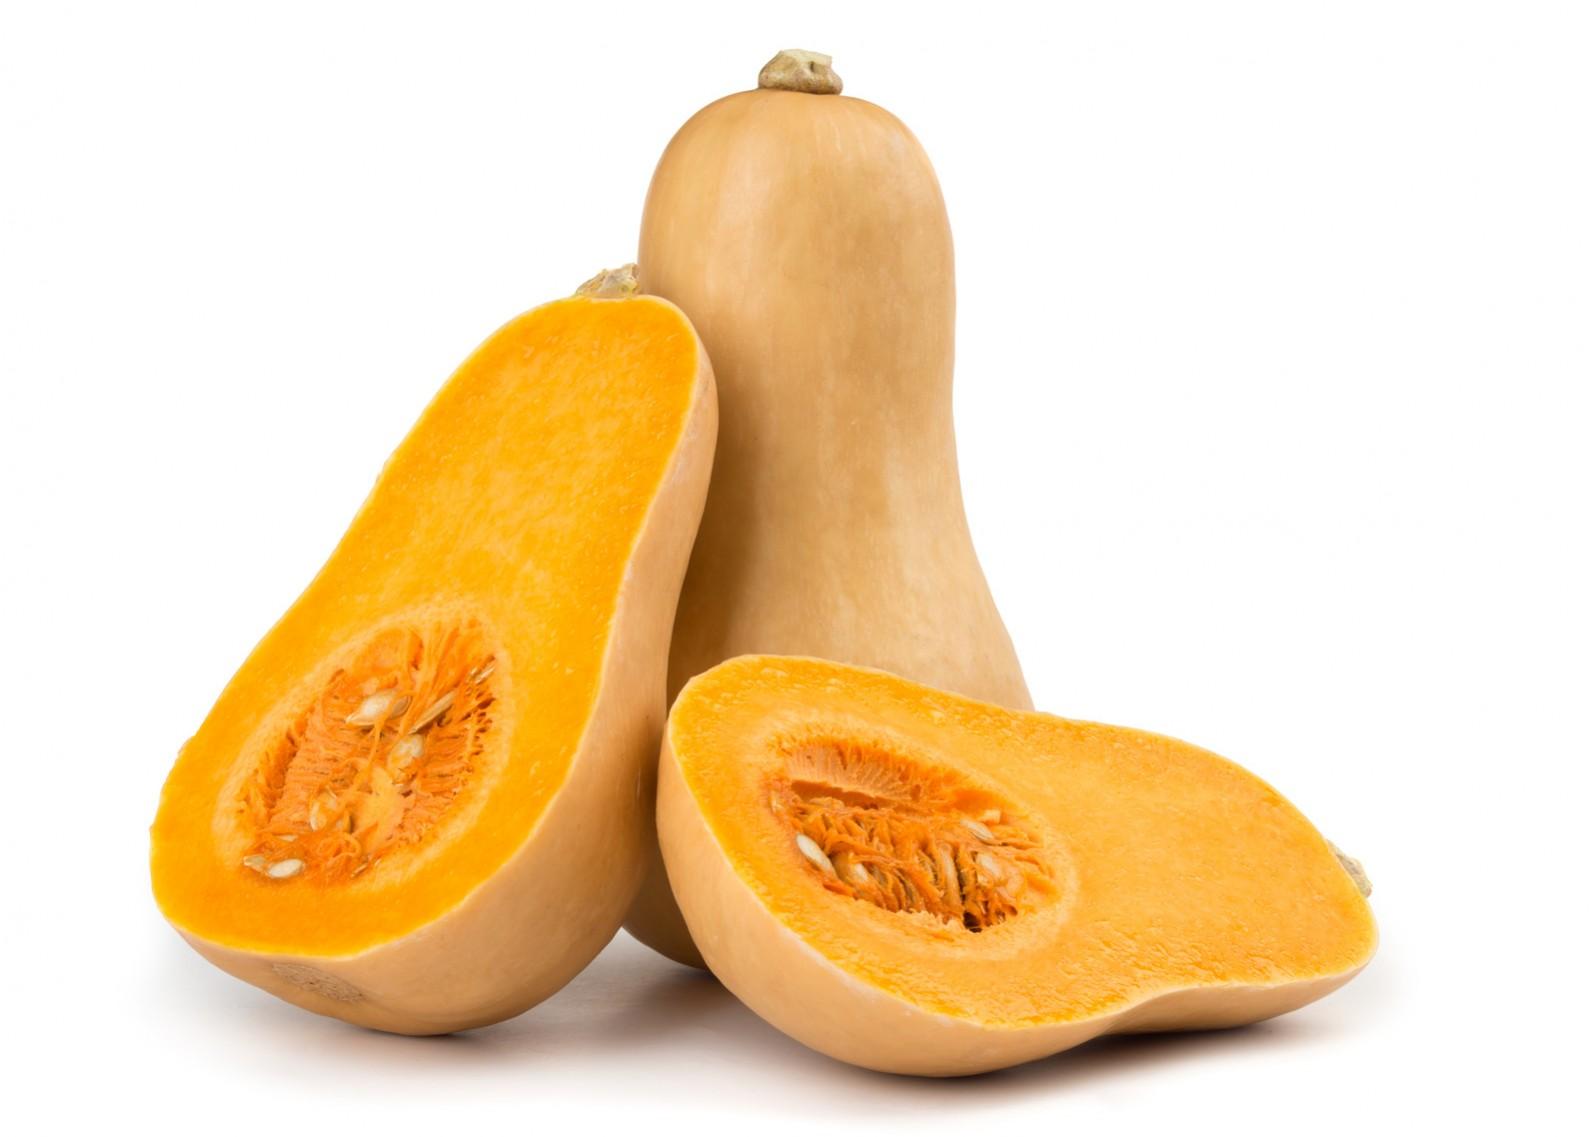 Butternut squash nutrition